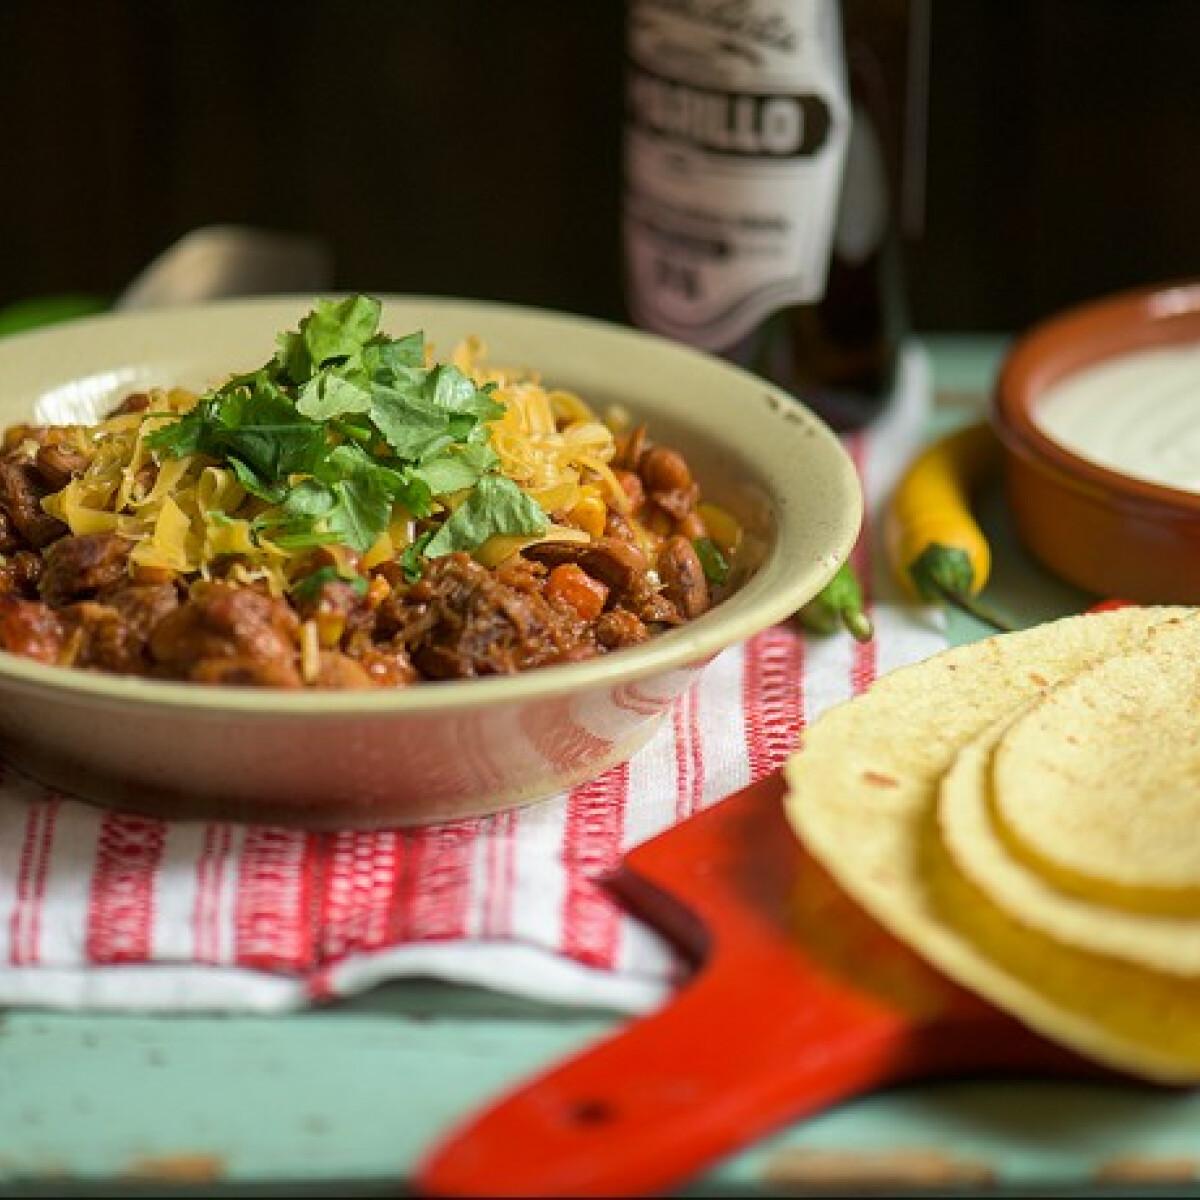 Ezen a képen: Ráérős chili con carne